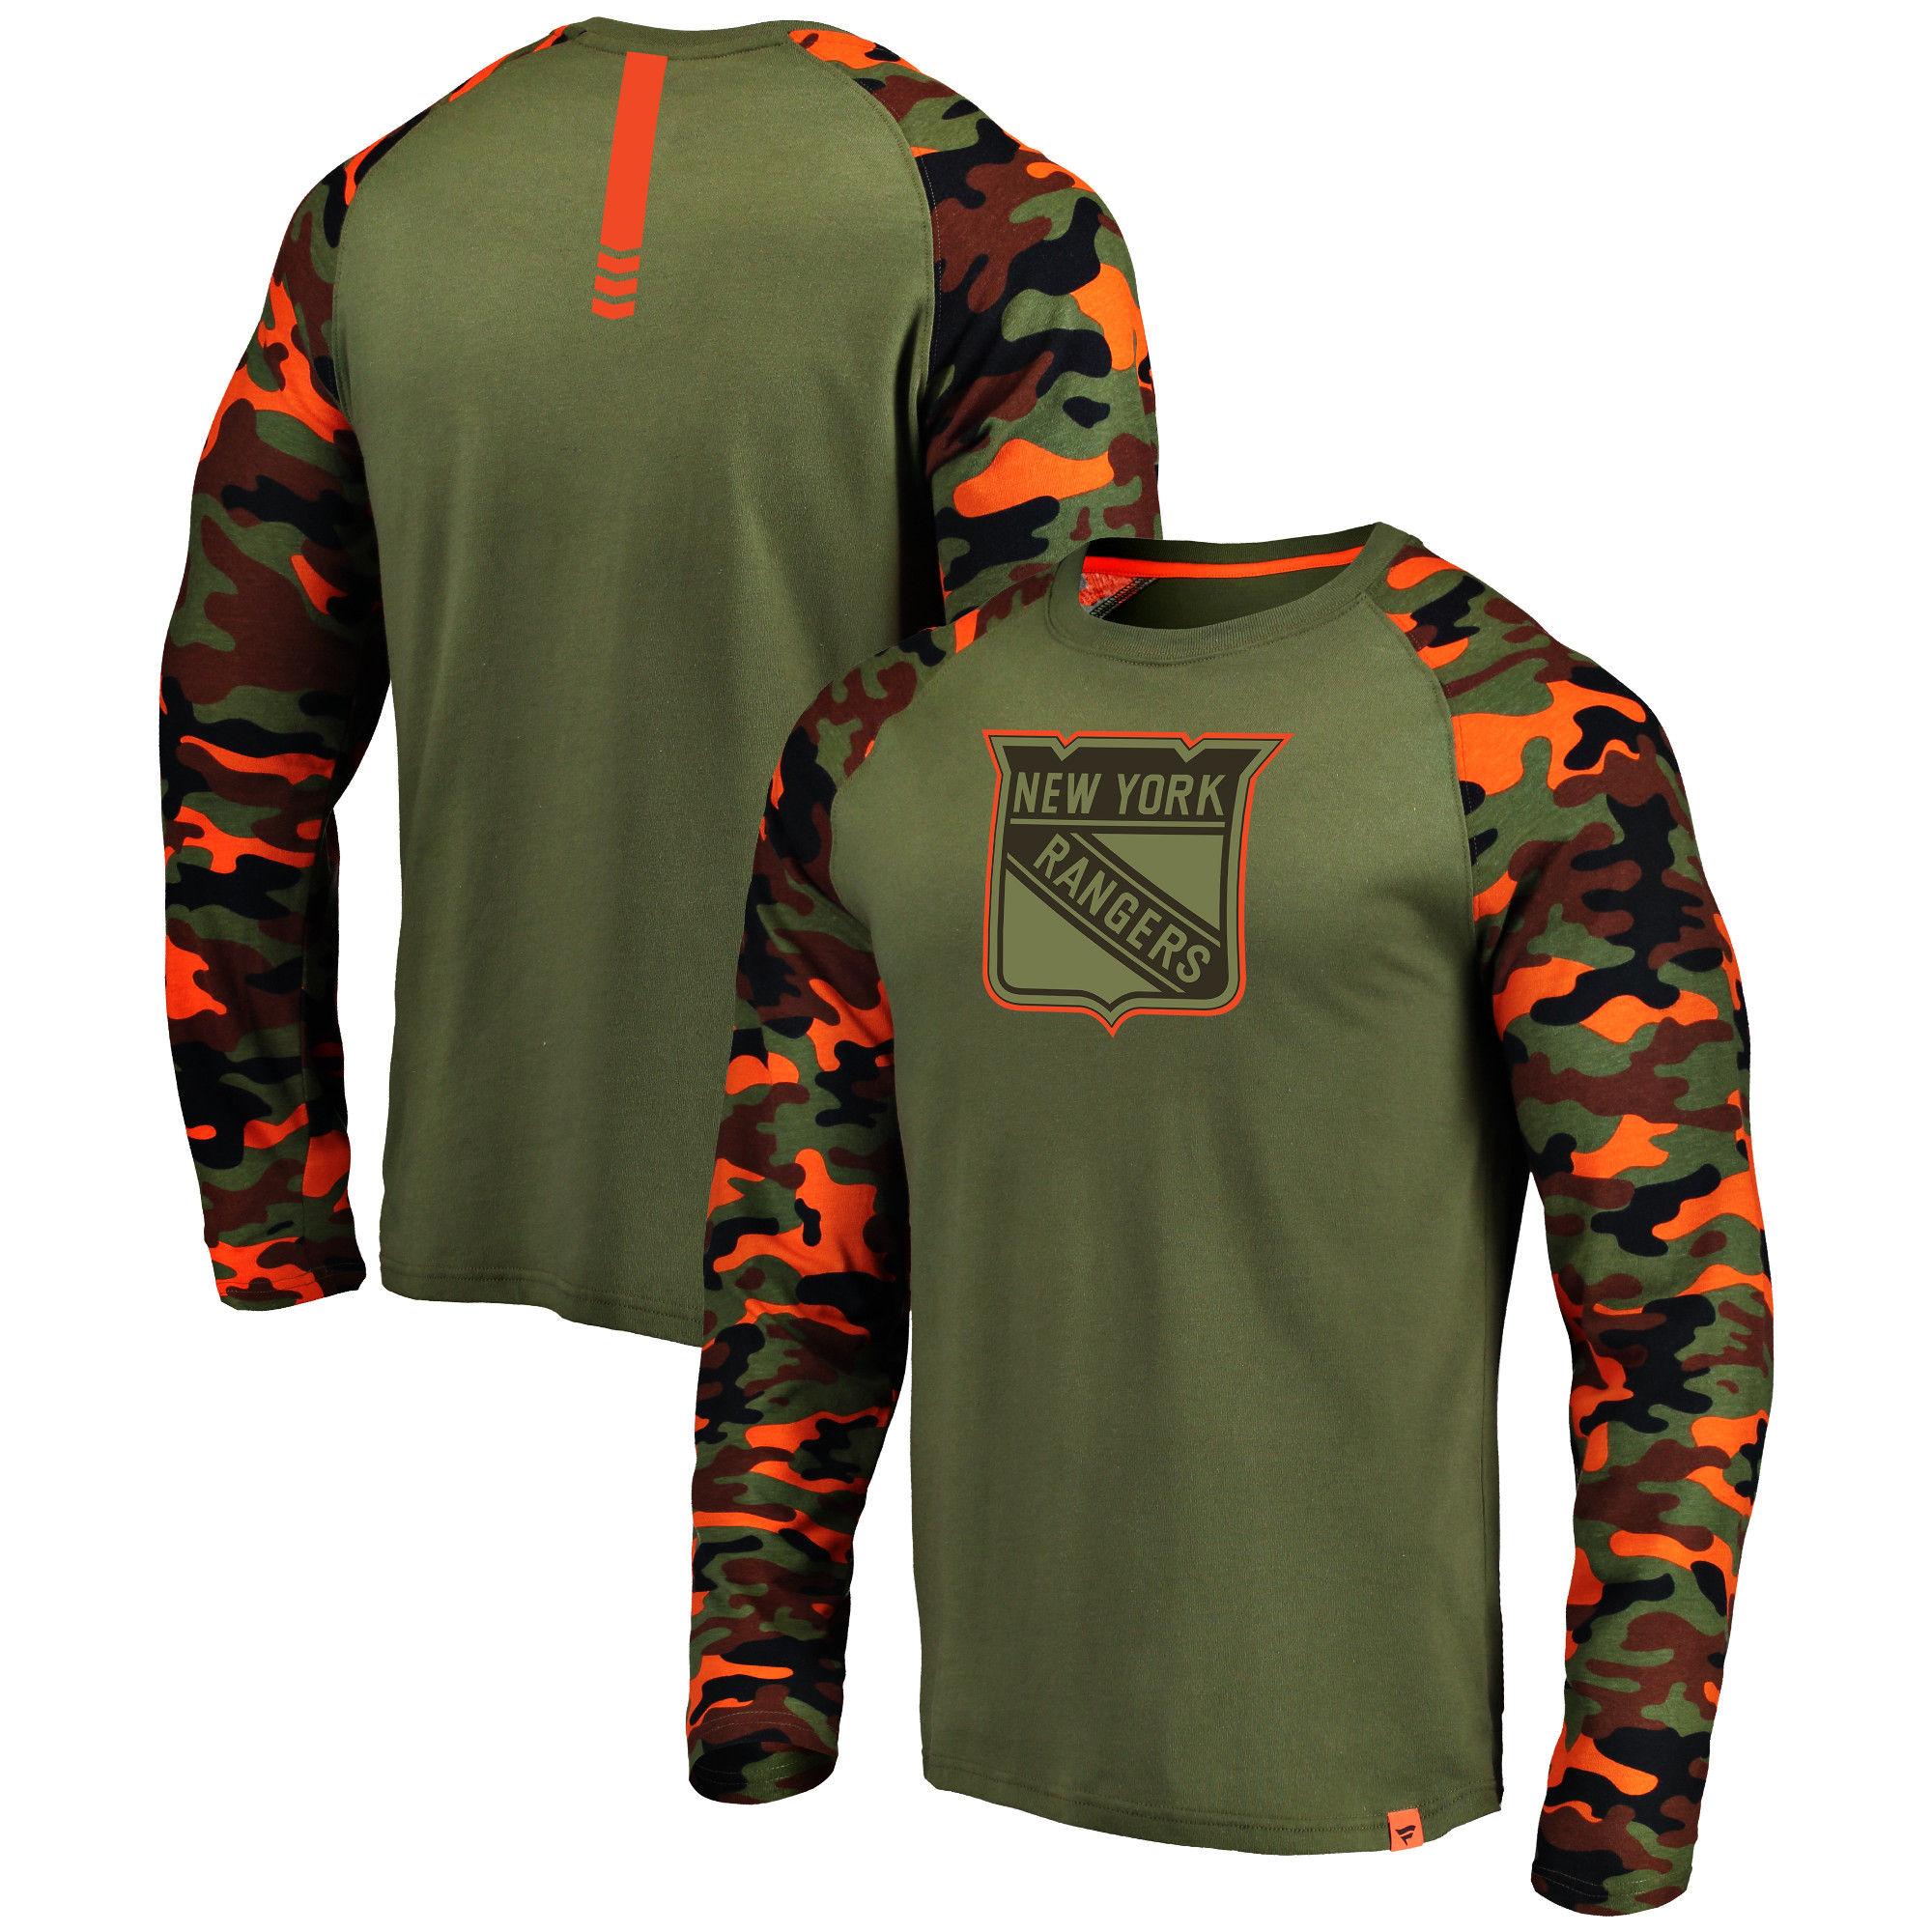 New York Rangers Fanatics Branded Olive/Camo Recon Long Sleeve Raglan T-Shirt